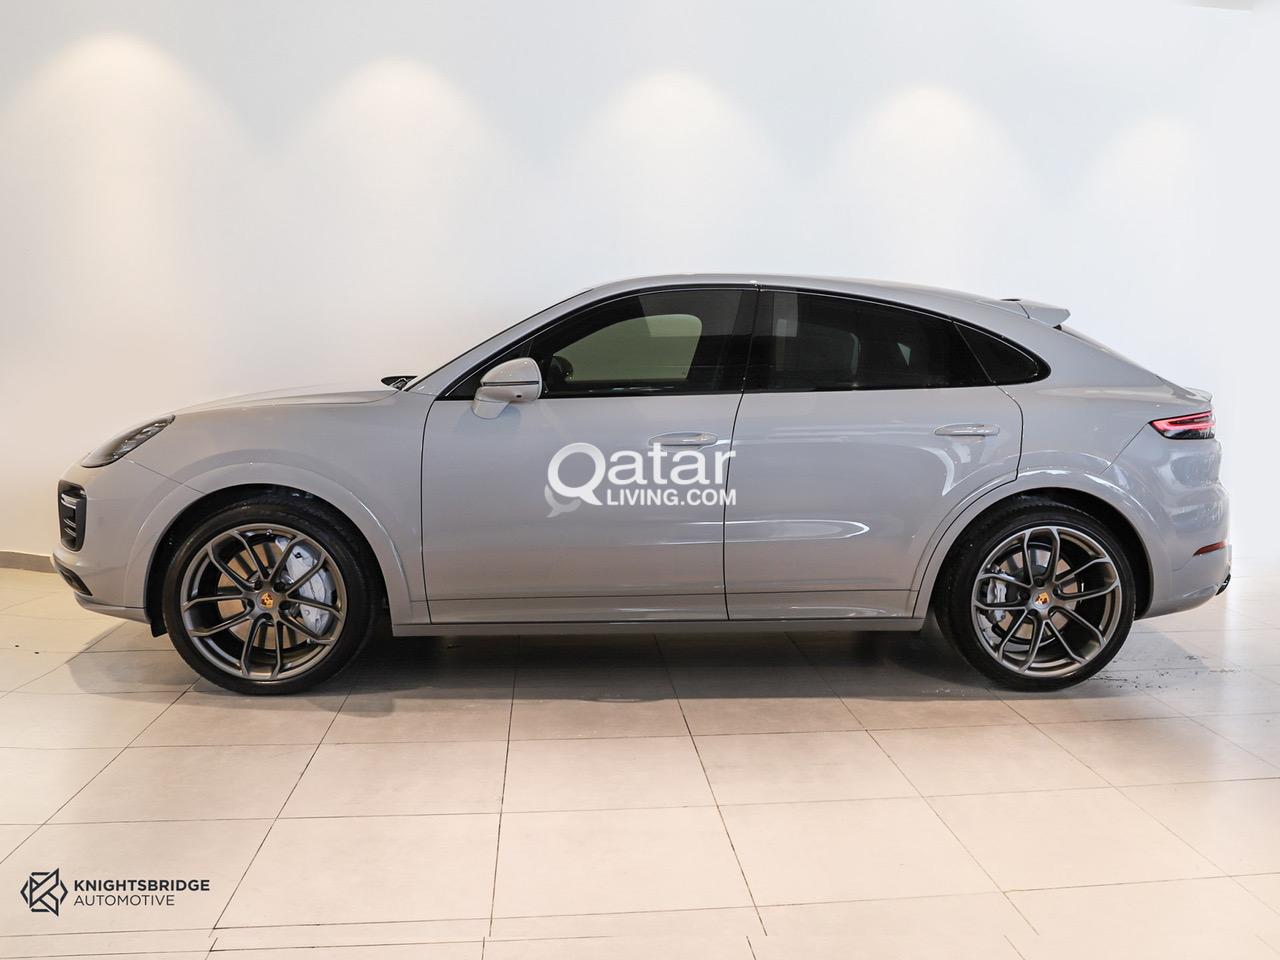 2020-Porsche Cayenne Turbo Coupe.